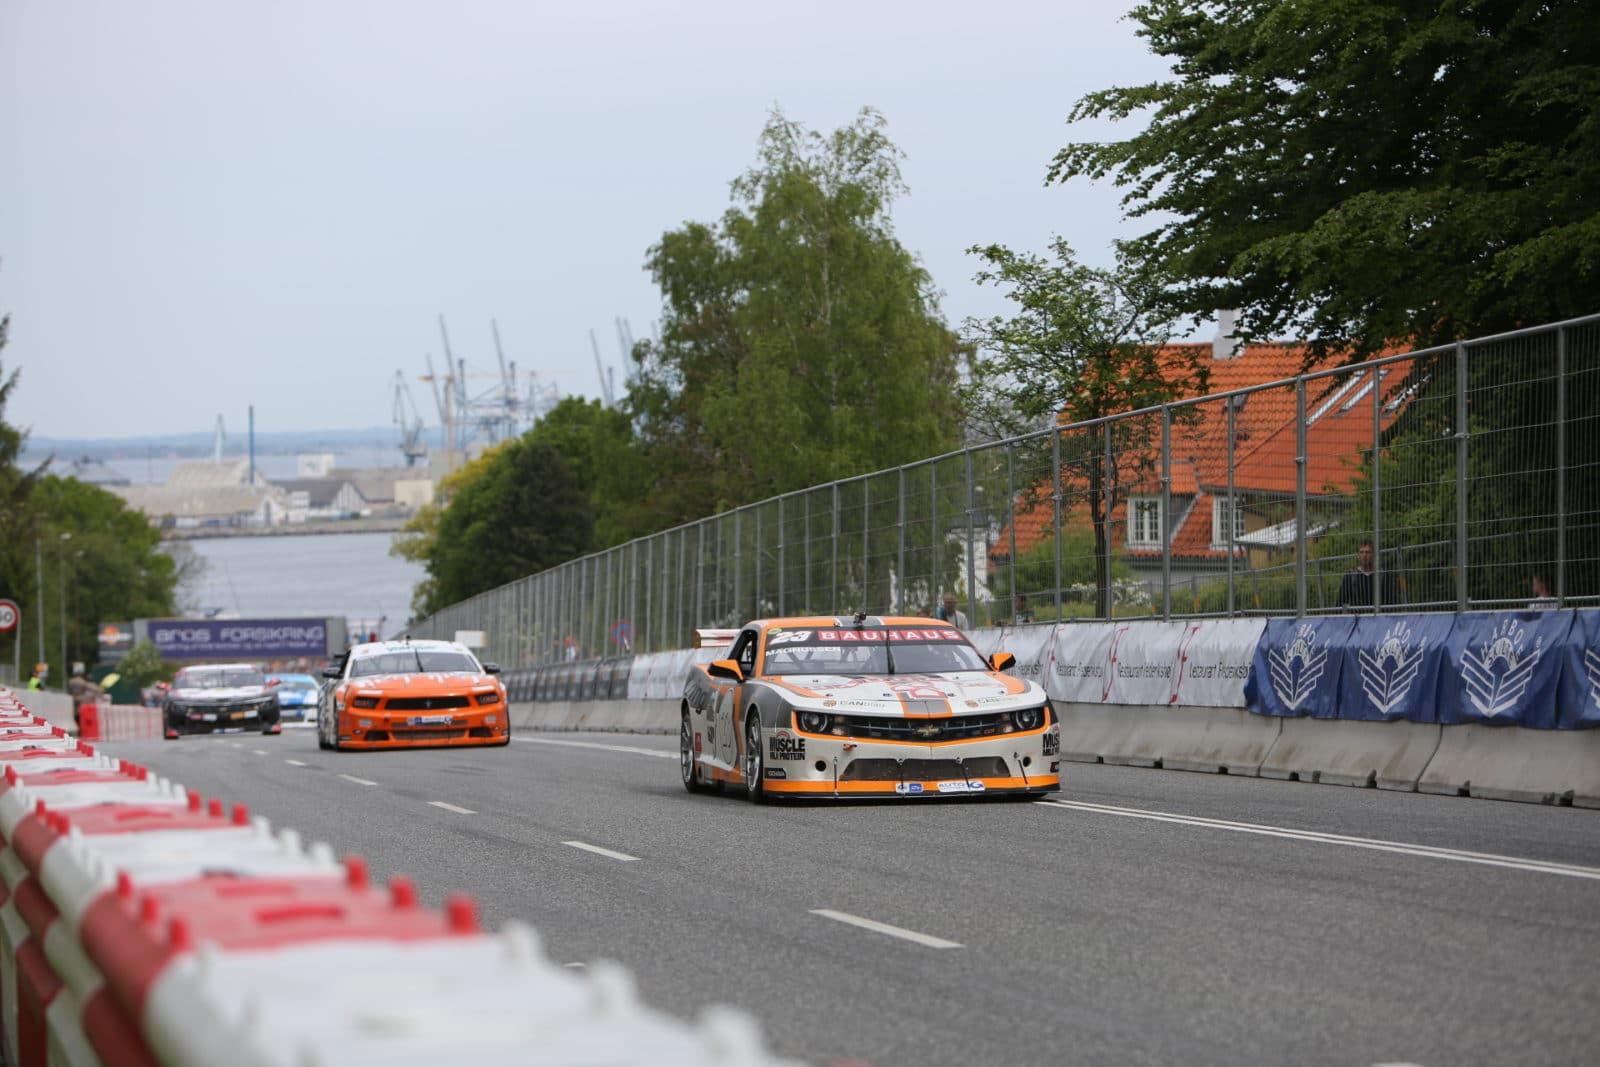 Jan Magnussen, Casper Elgaard, dtc race 2 CRAA 2014 Foto: Thomas Norsted / Racemag